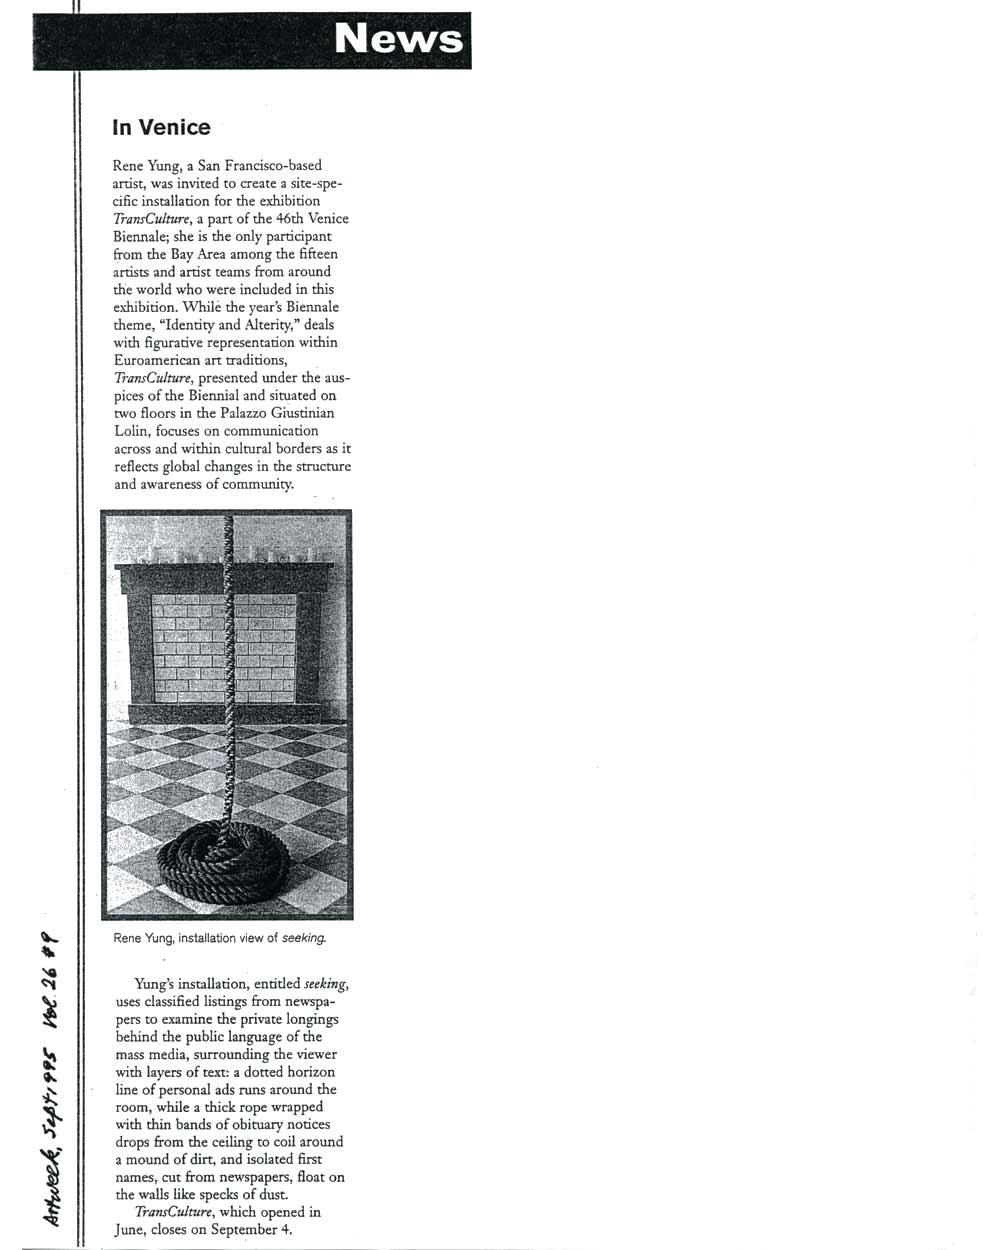 In Venice, article